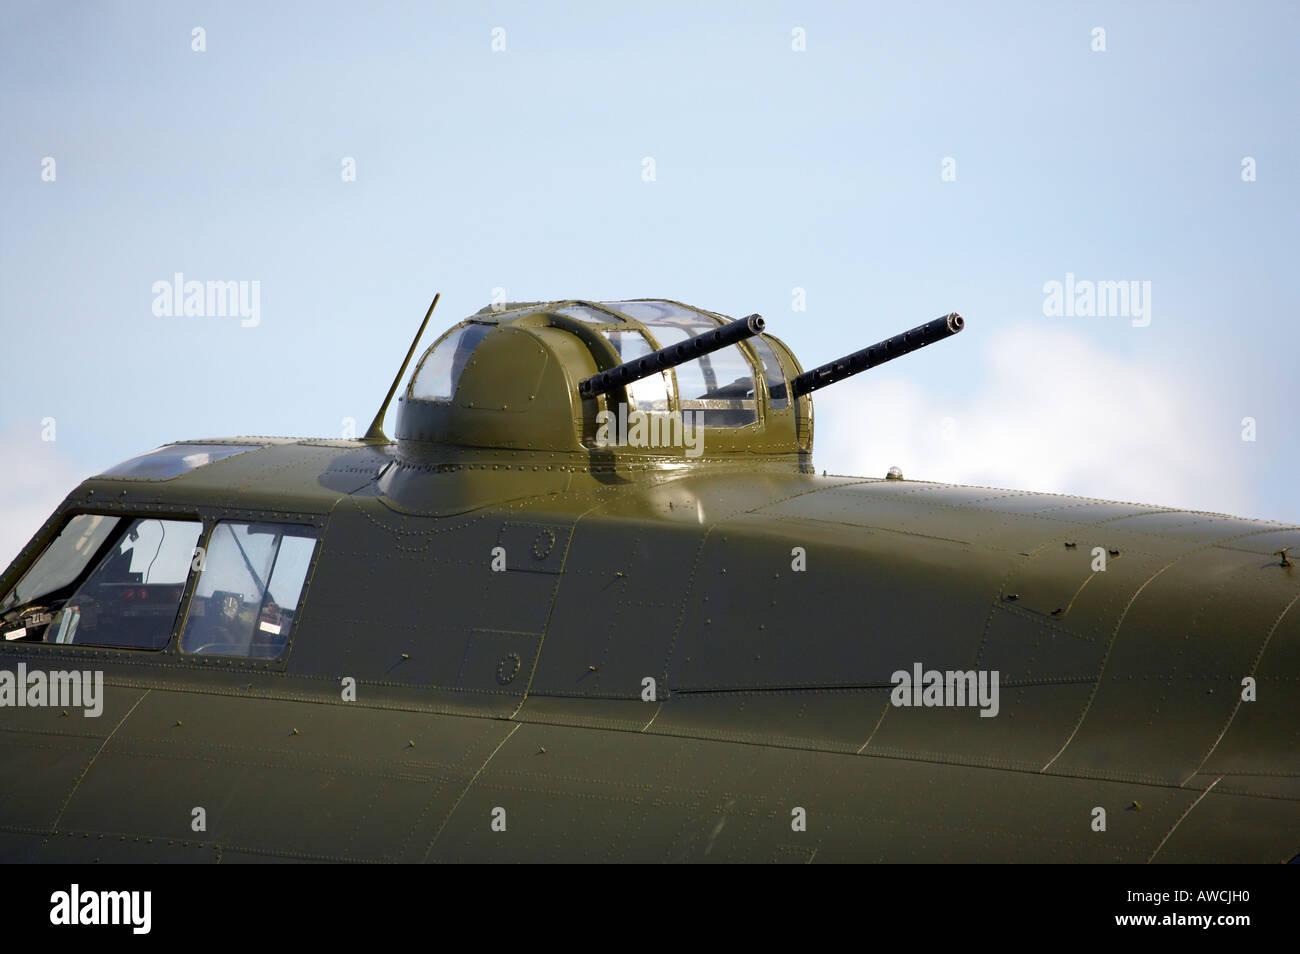 Top gun turret of B17 flying fortress Sally B Duxford aerodrome UK - Stock Image